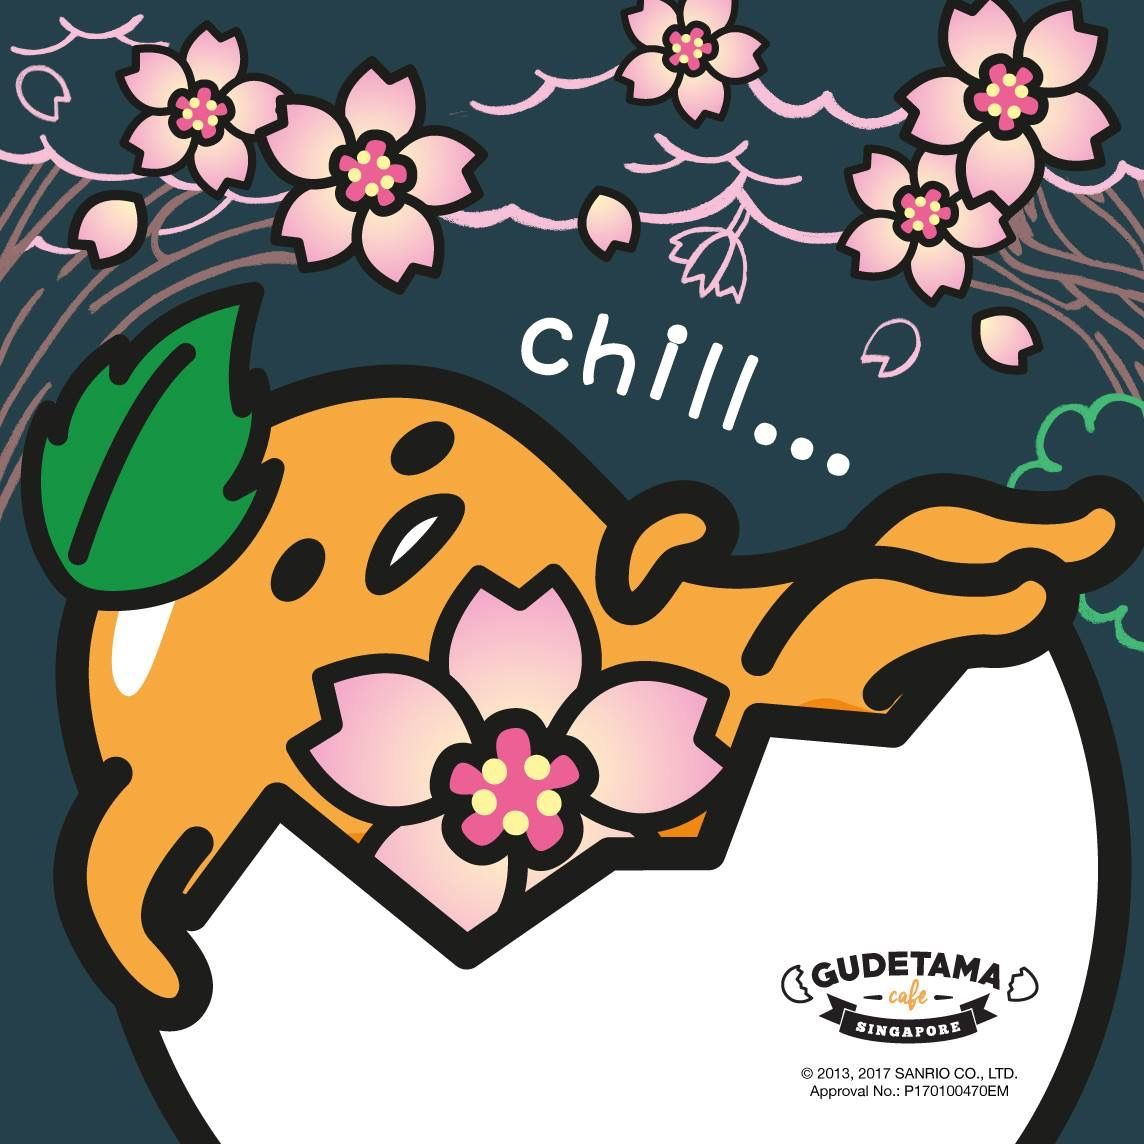 Cool Wallpaper Hello Kitty Facebook - fb90bcca114150b81c1715adbad5bad3  Trends_377694.jpg